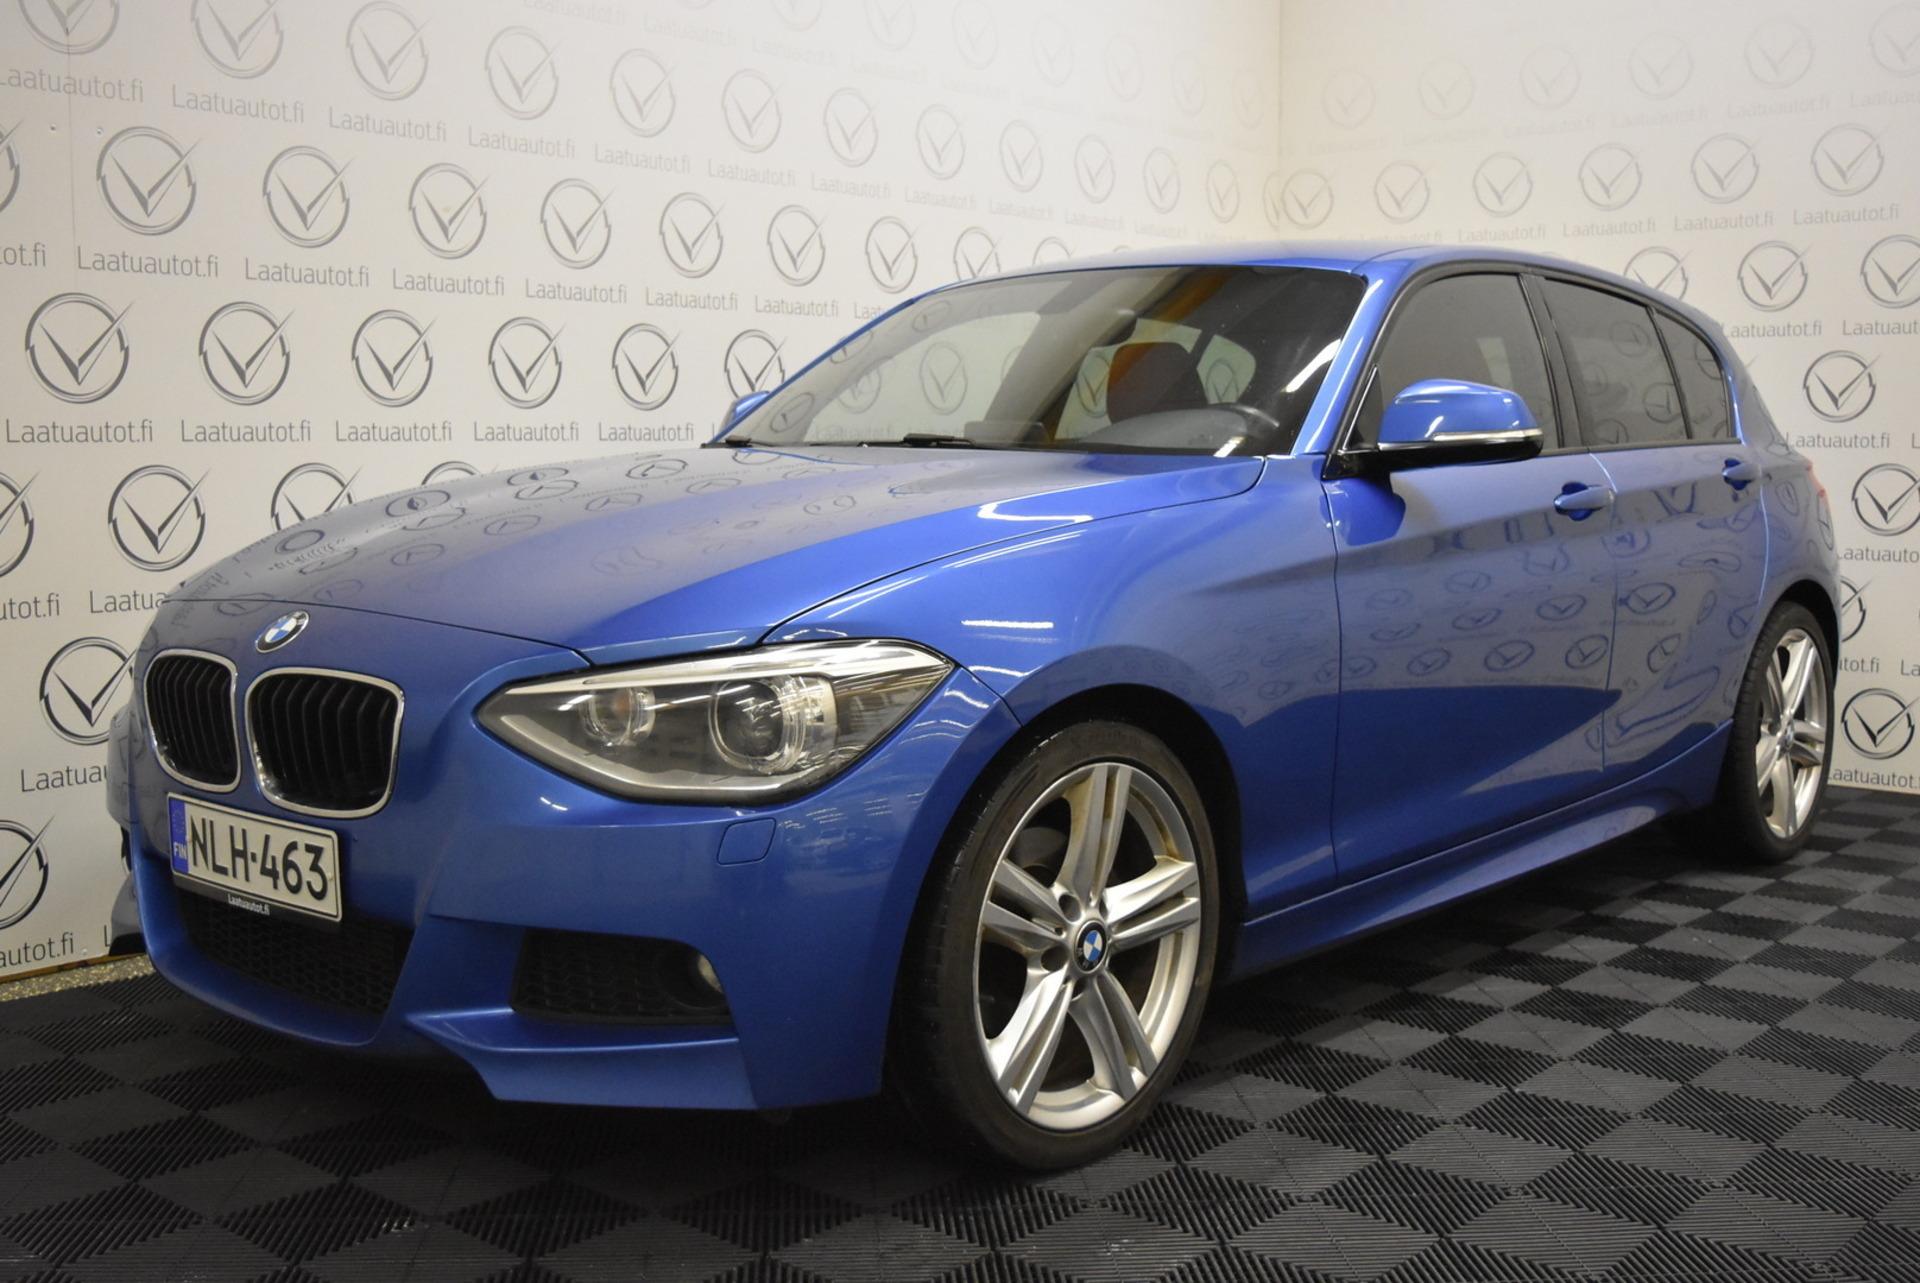 BMW 120 F20 TwinPower Turbo A M-Sport - Korko 1, 89% jopa ilman käsirahaa! M-Sport,  Dakota Nahat,  Xenon,  PDC